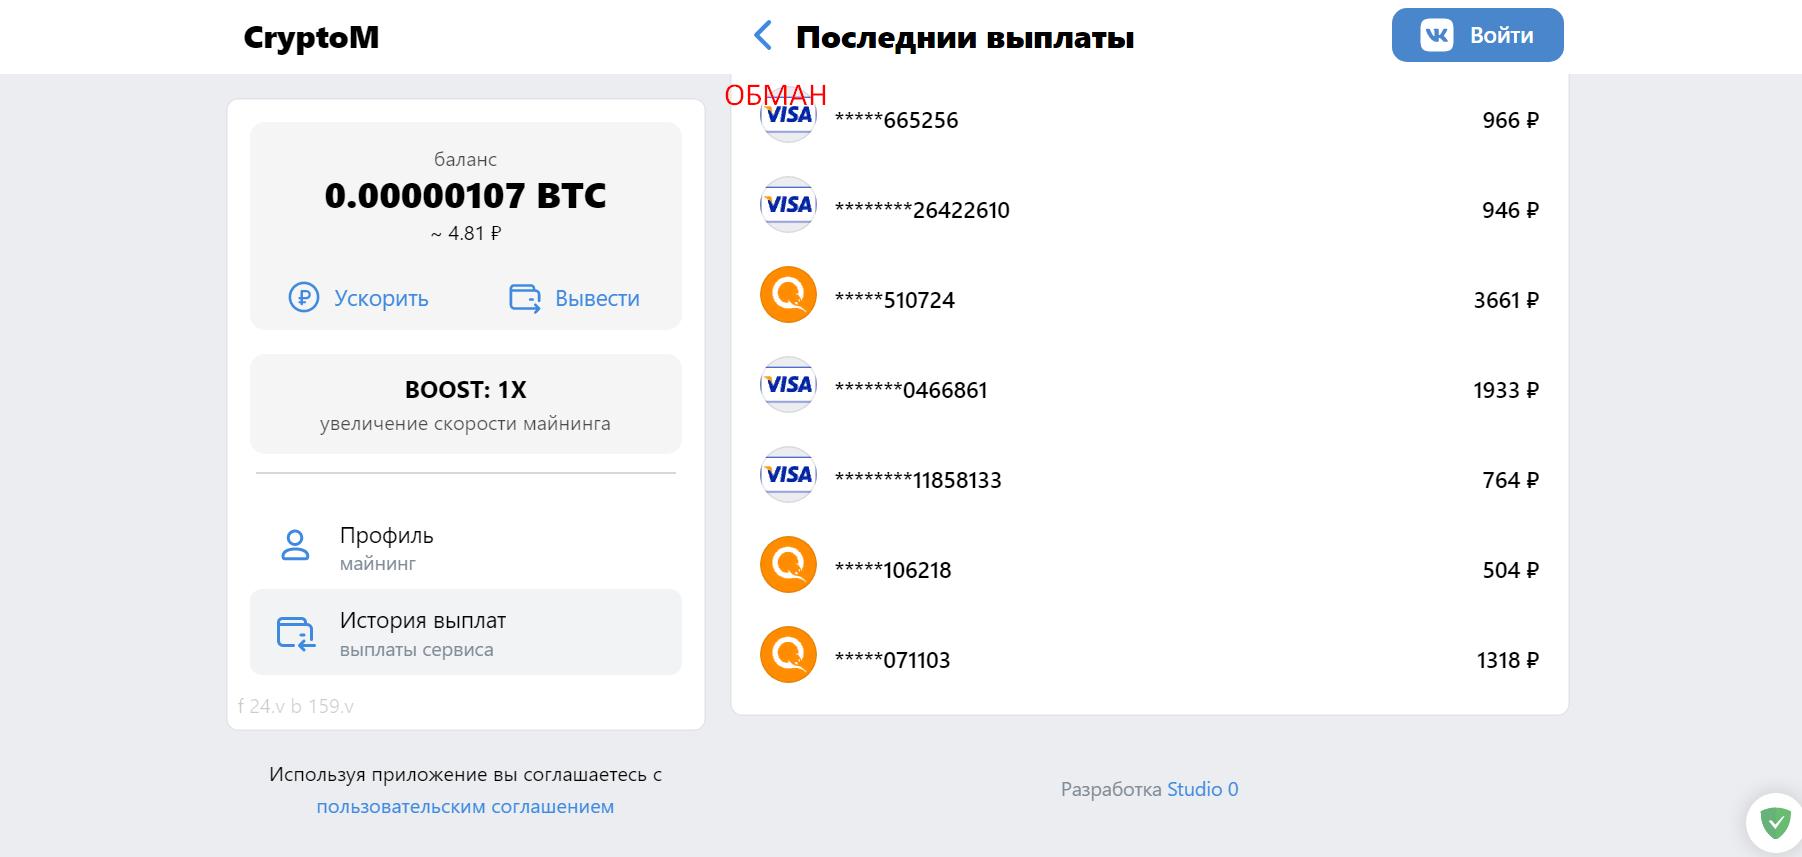 CryptoM.cash обман